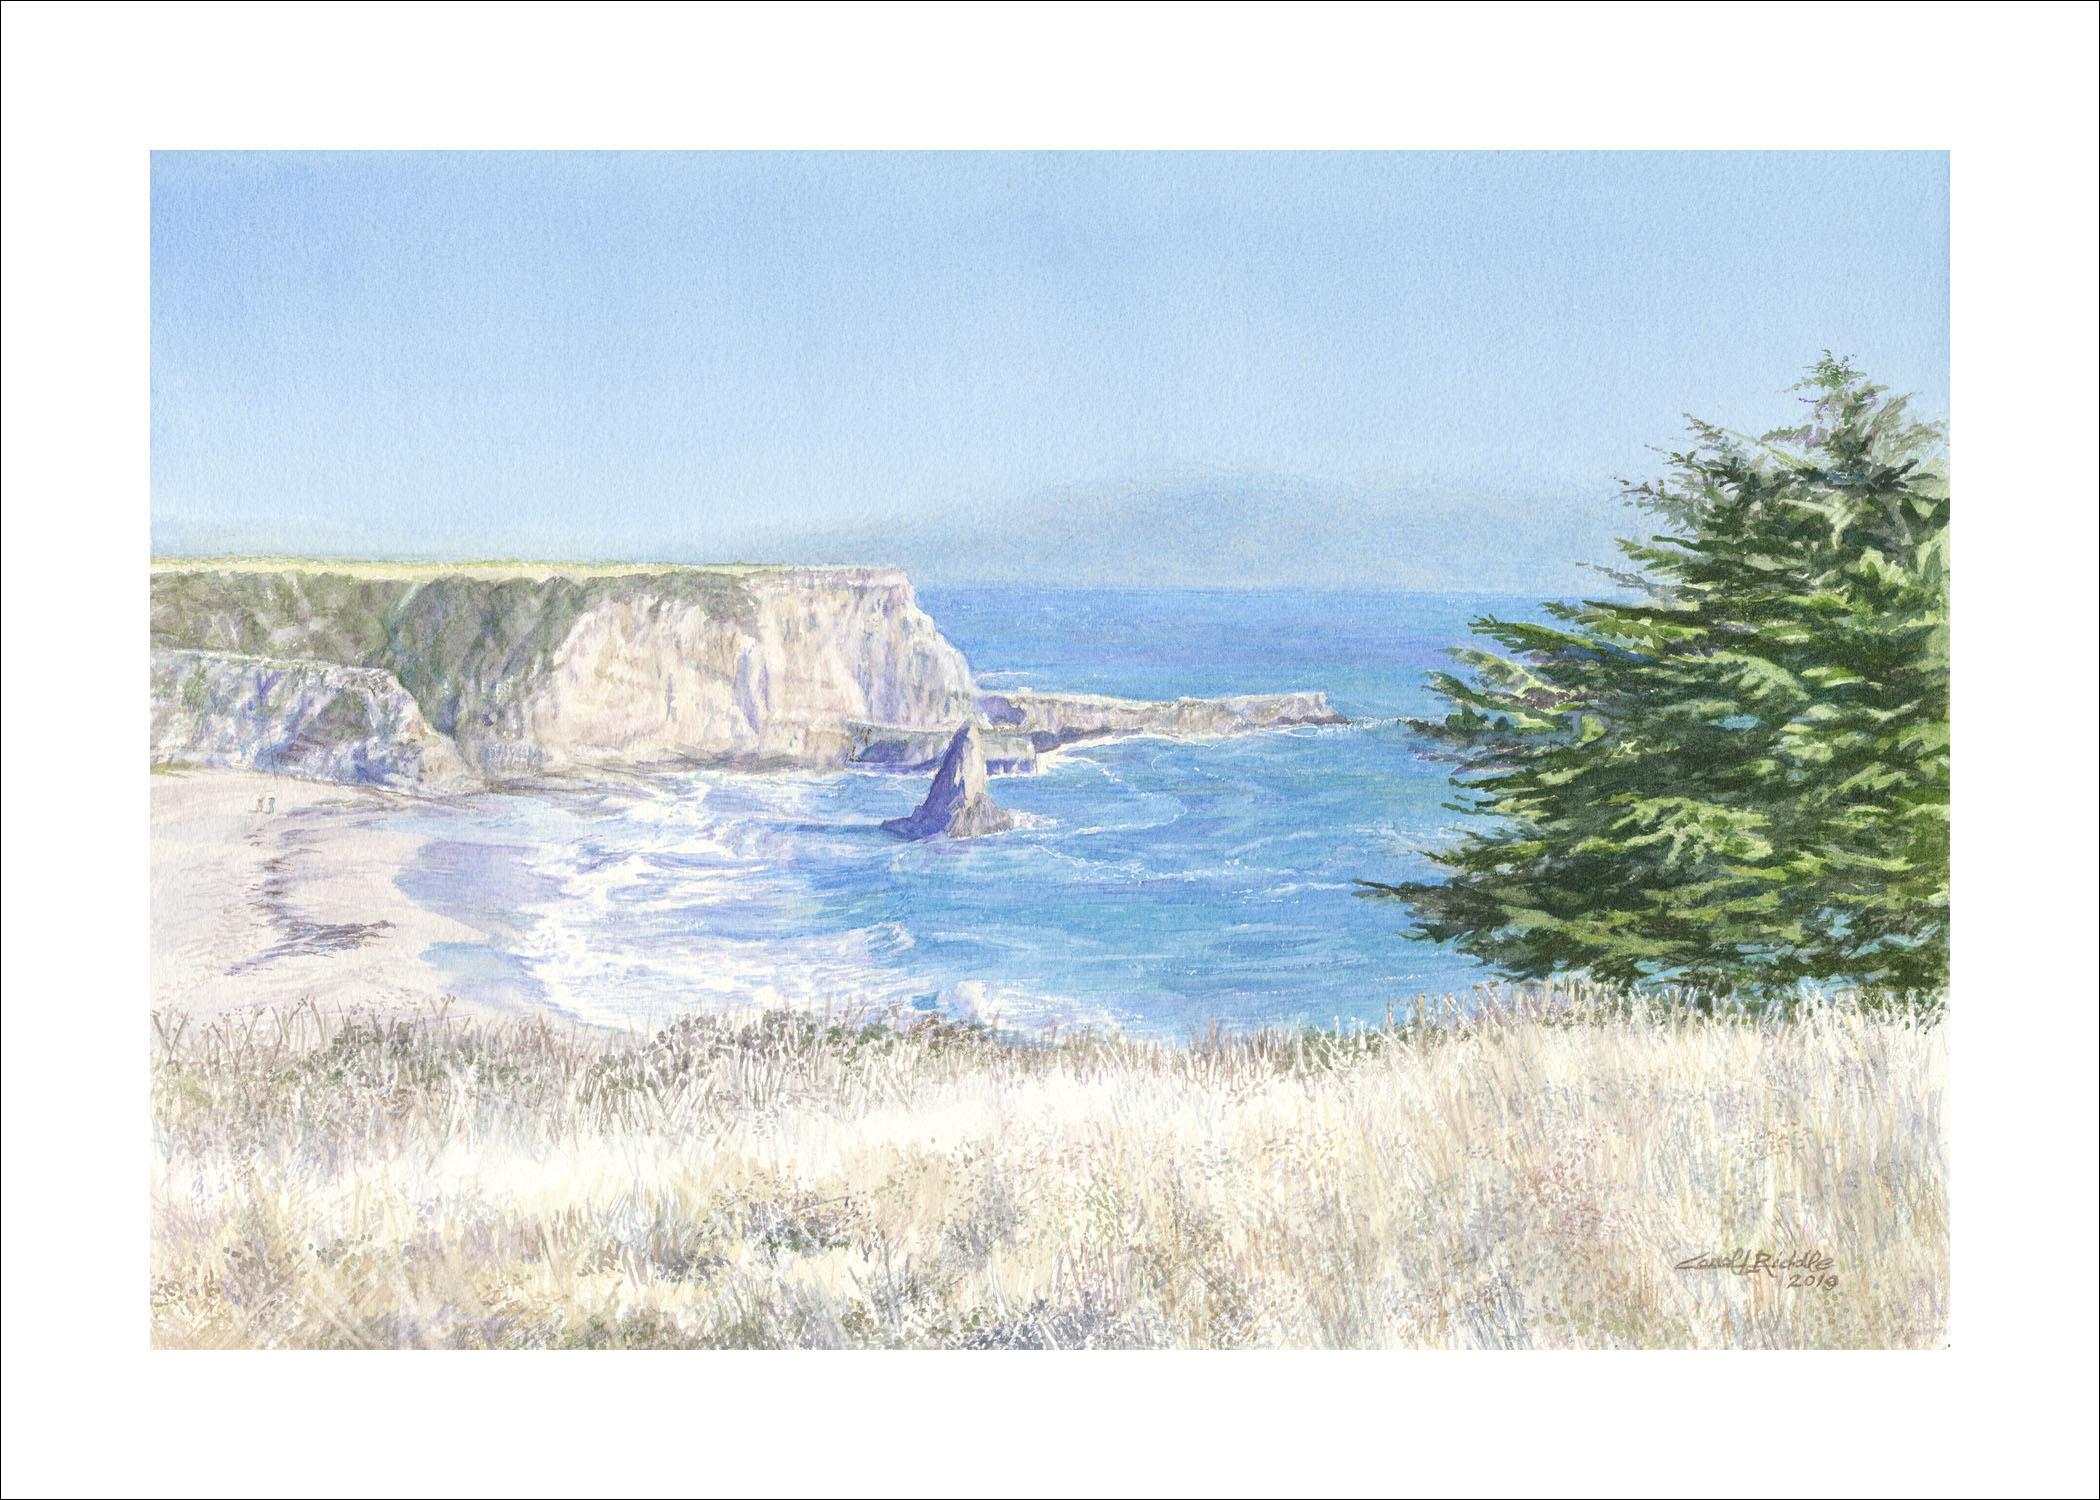 Davenport Beach - Carol Riddle